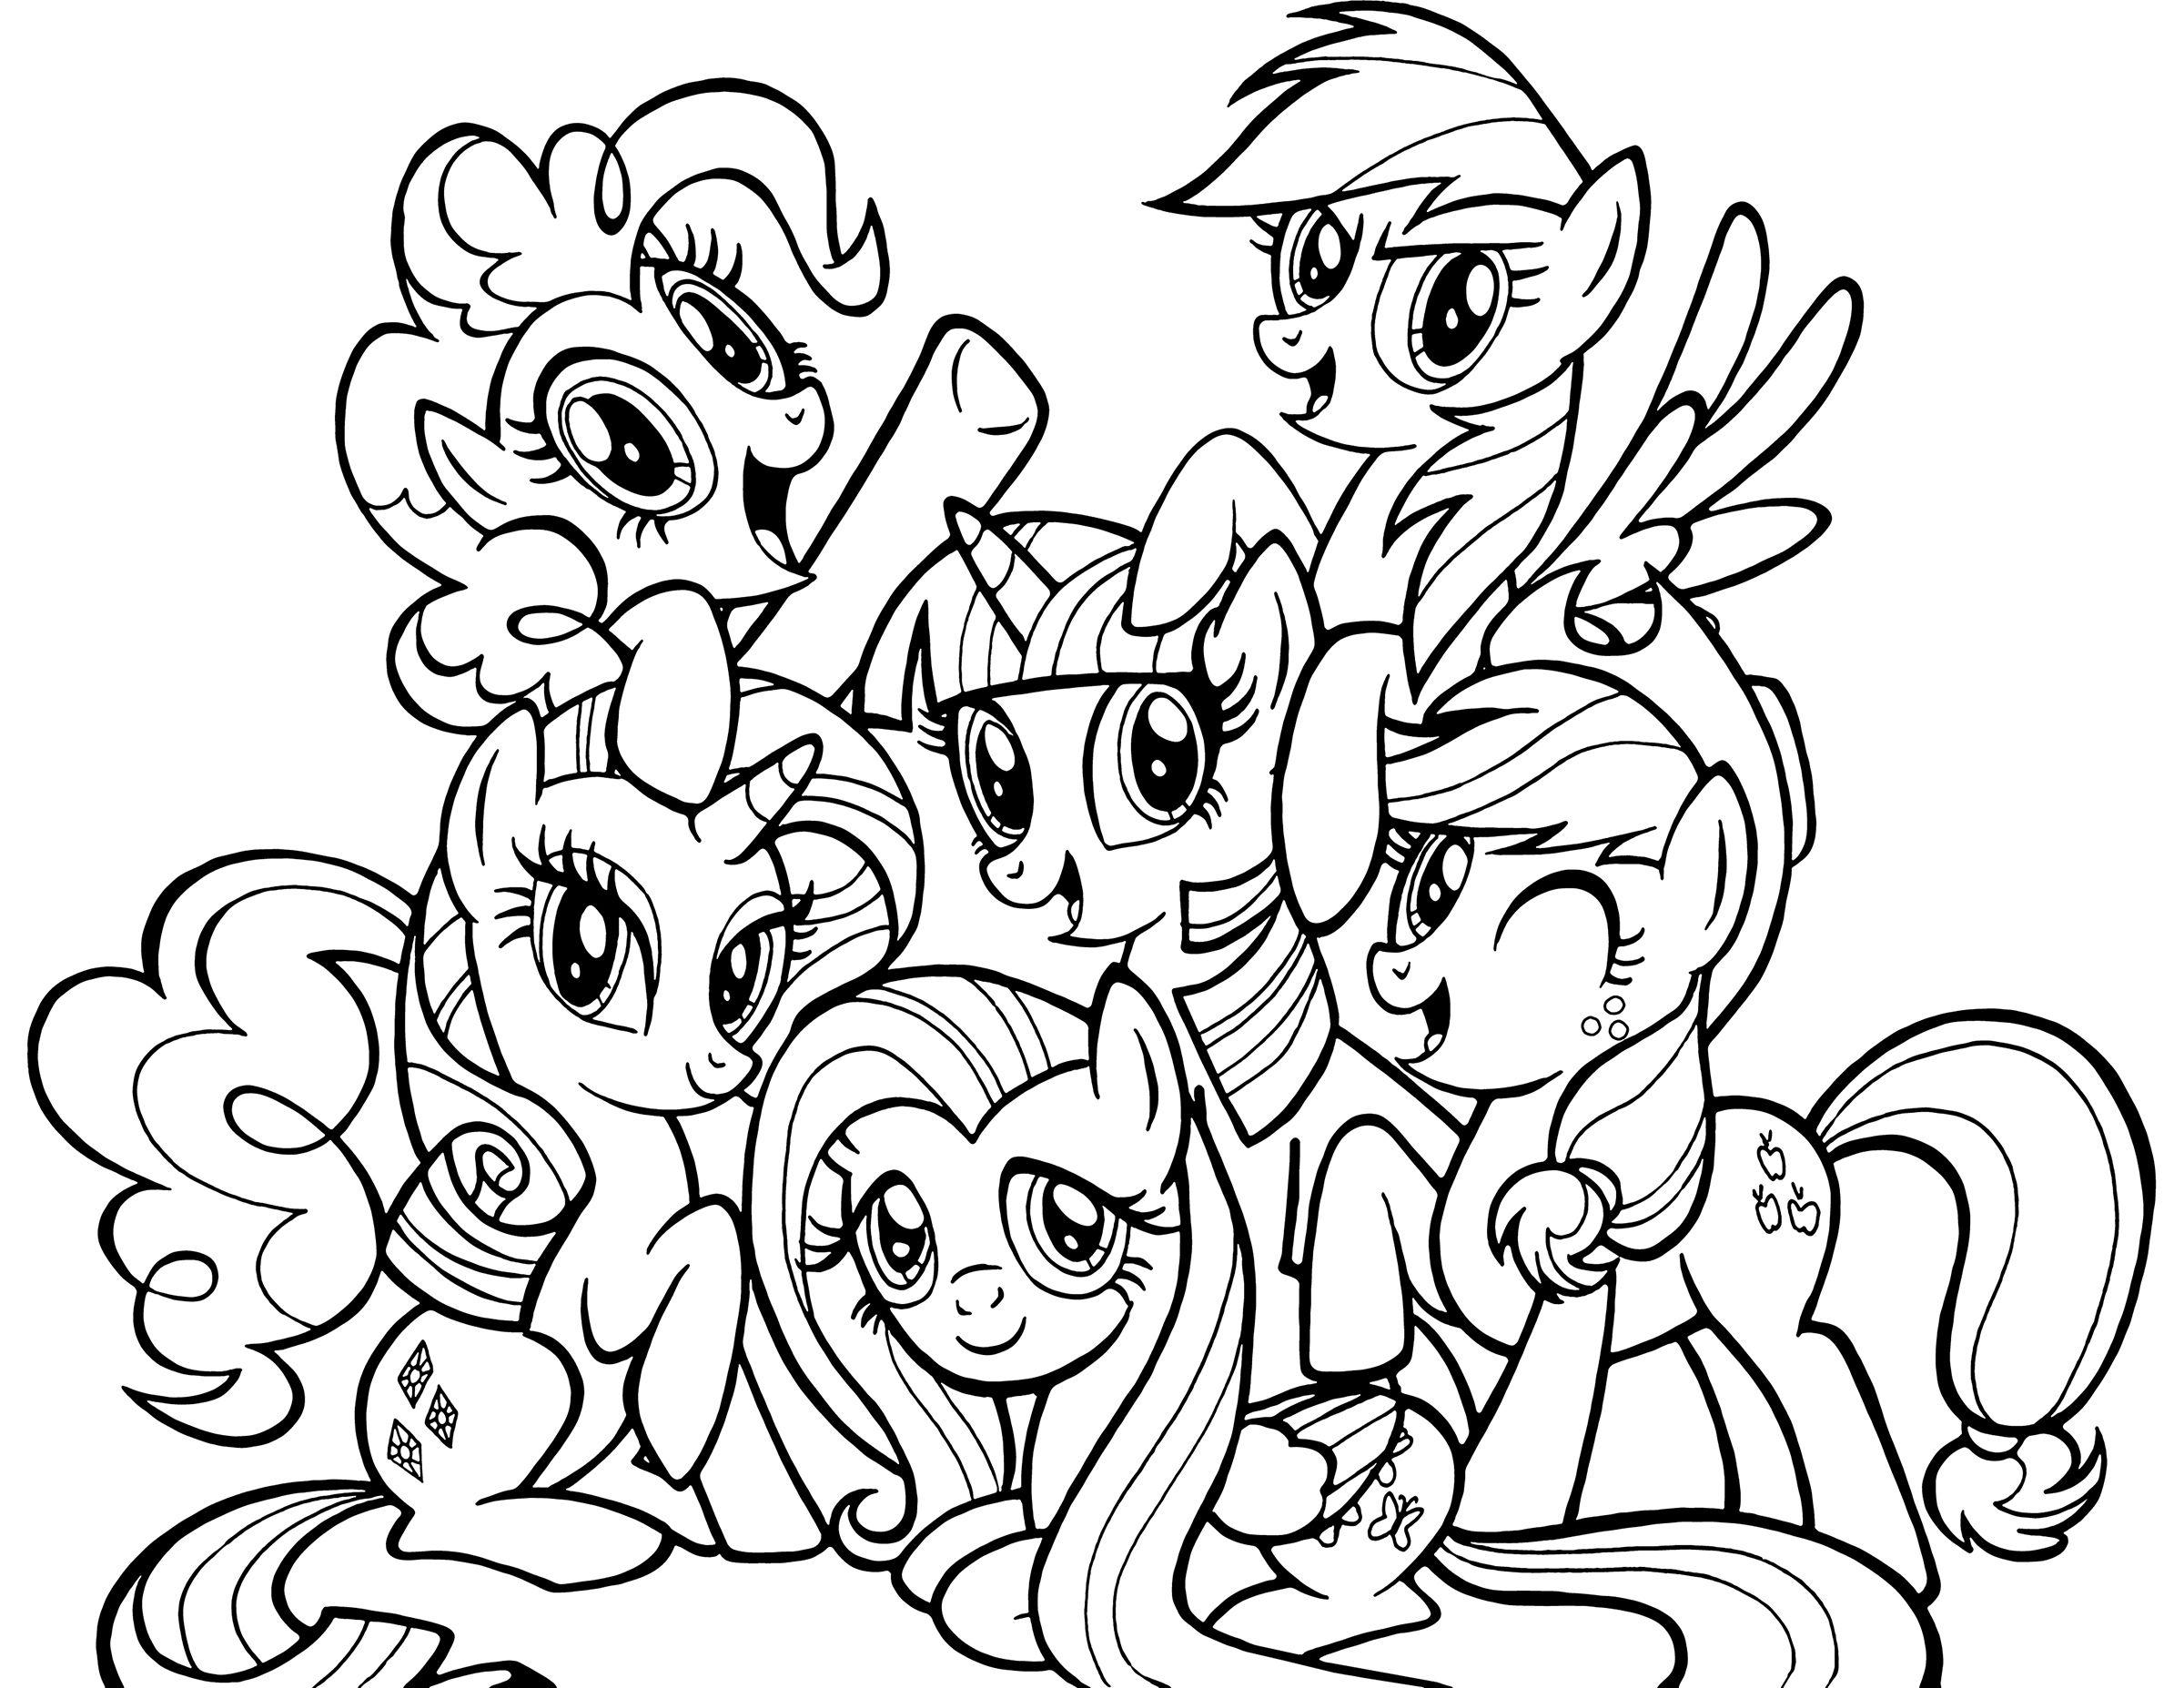 my little ponies coloring pages páginas para colorear originales original coloring pages coloring little pages ponies my